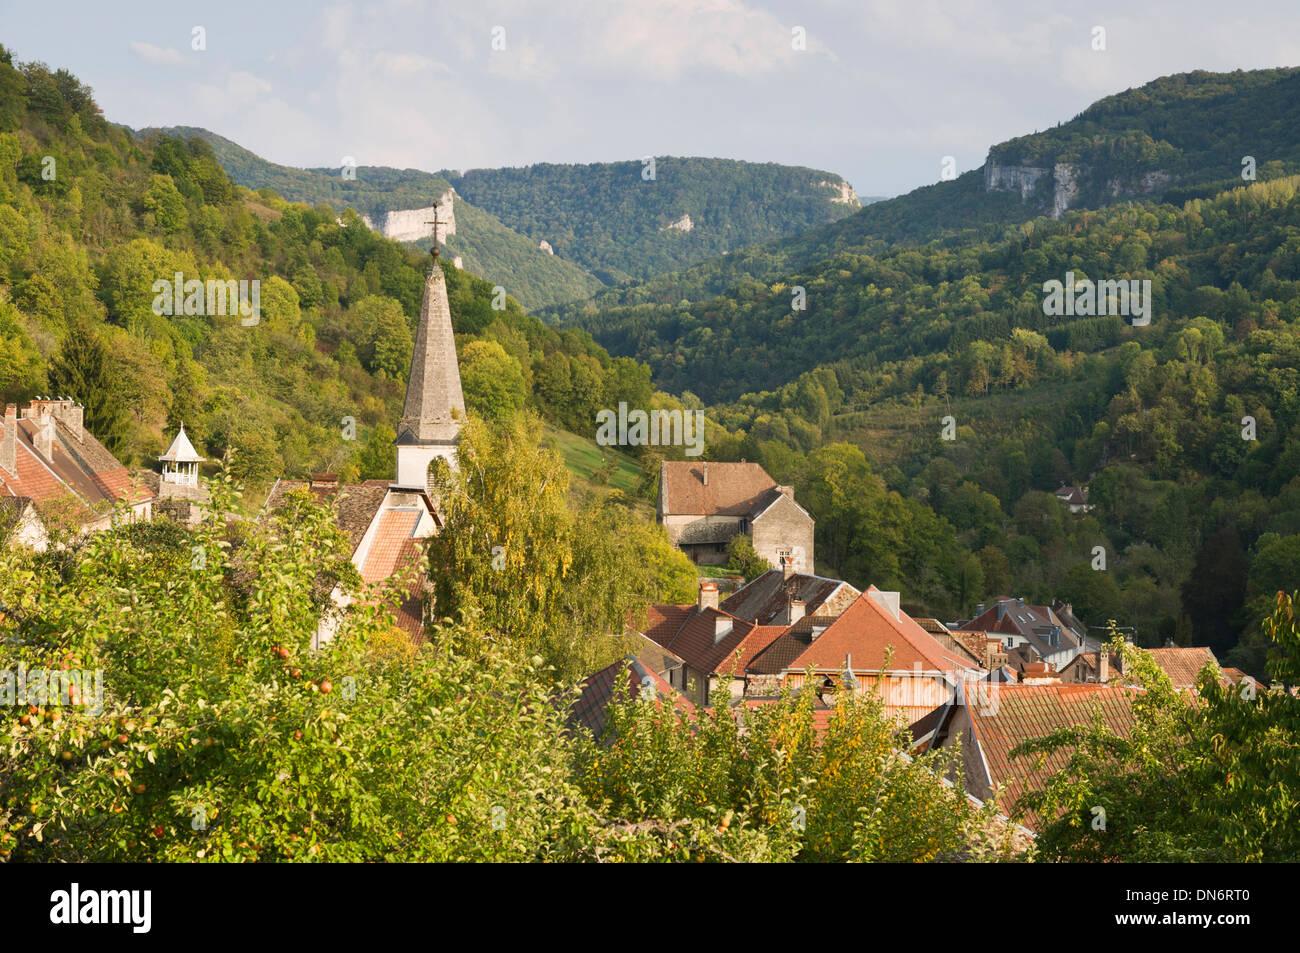 Elk213-3000 France, Alsace, Route des Cretes, hillside village - Stock Image